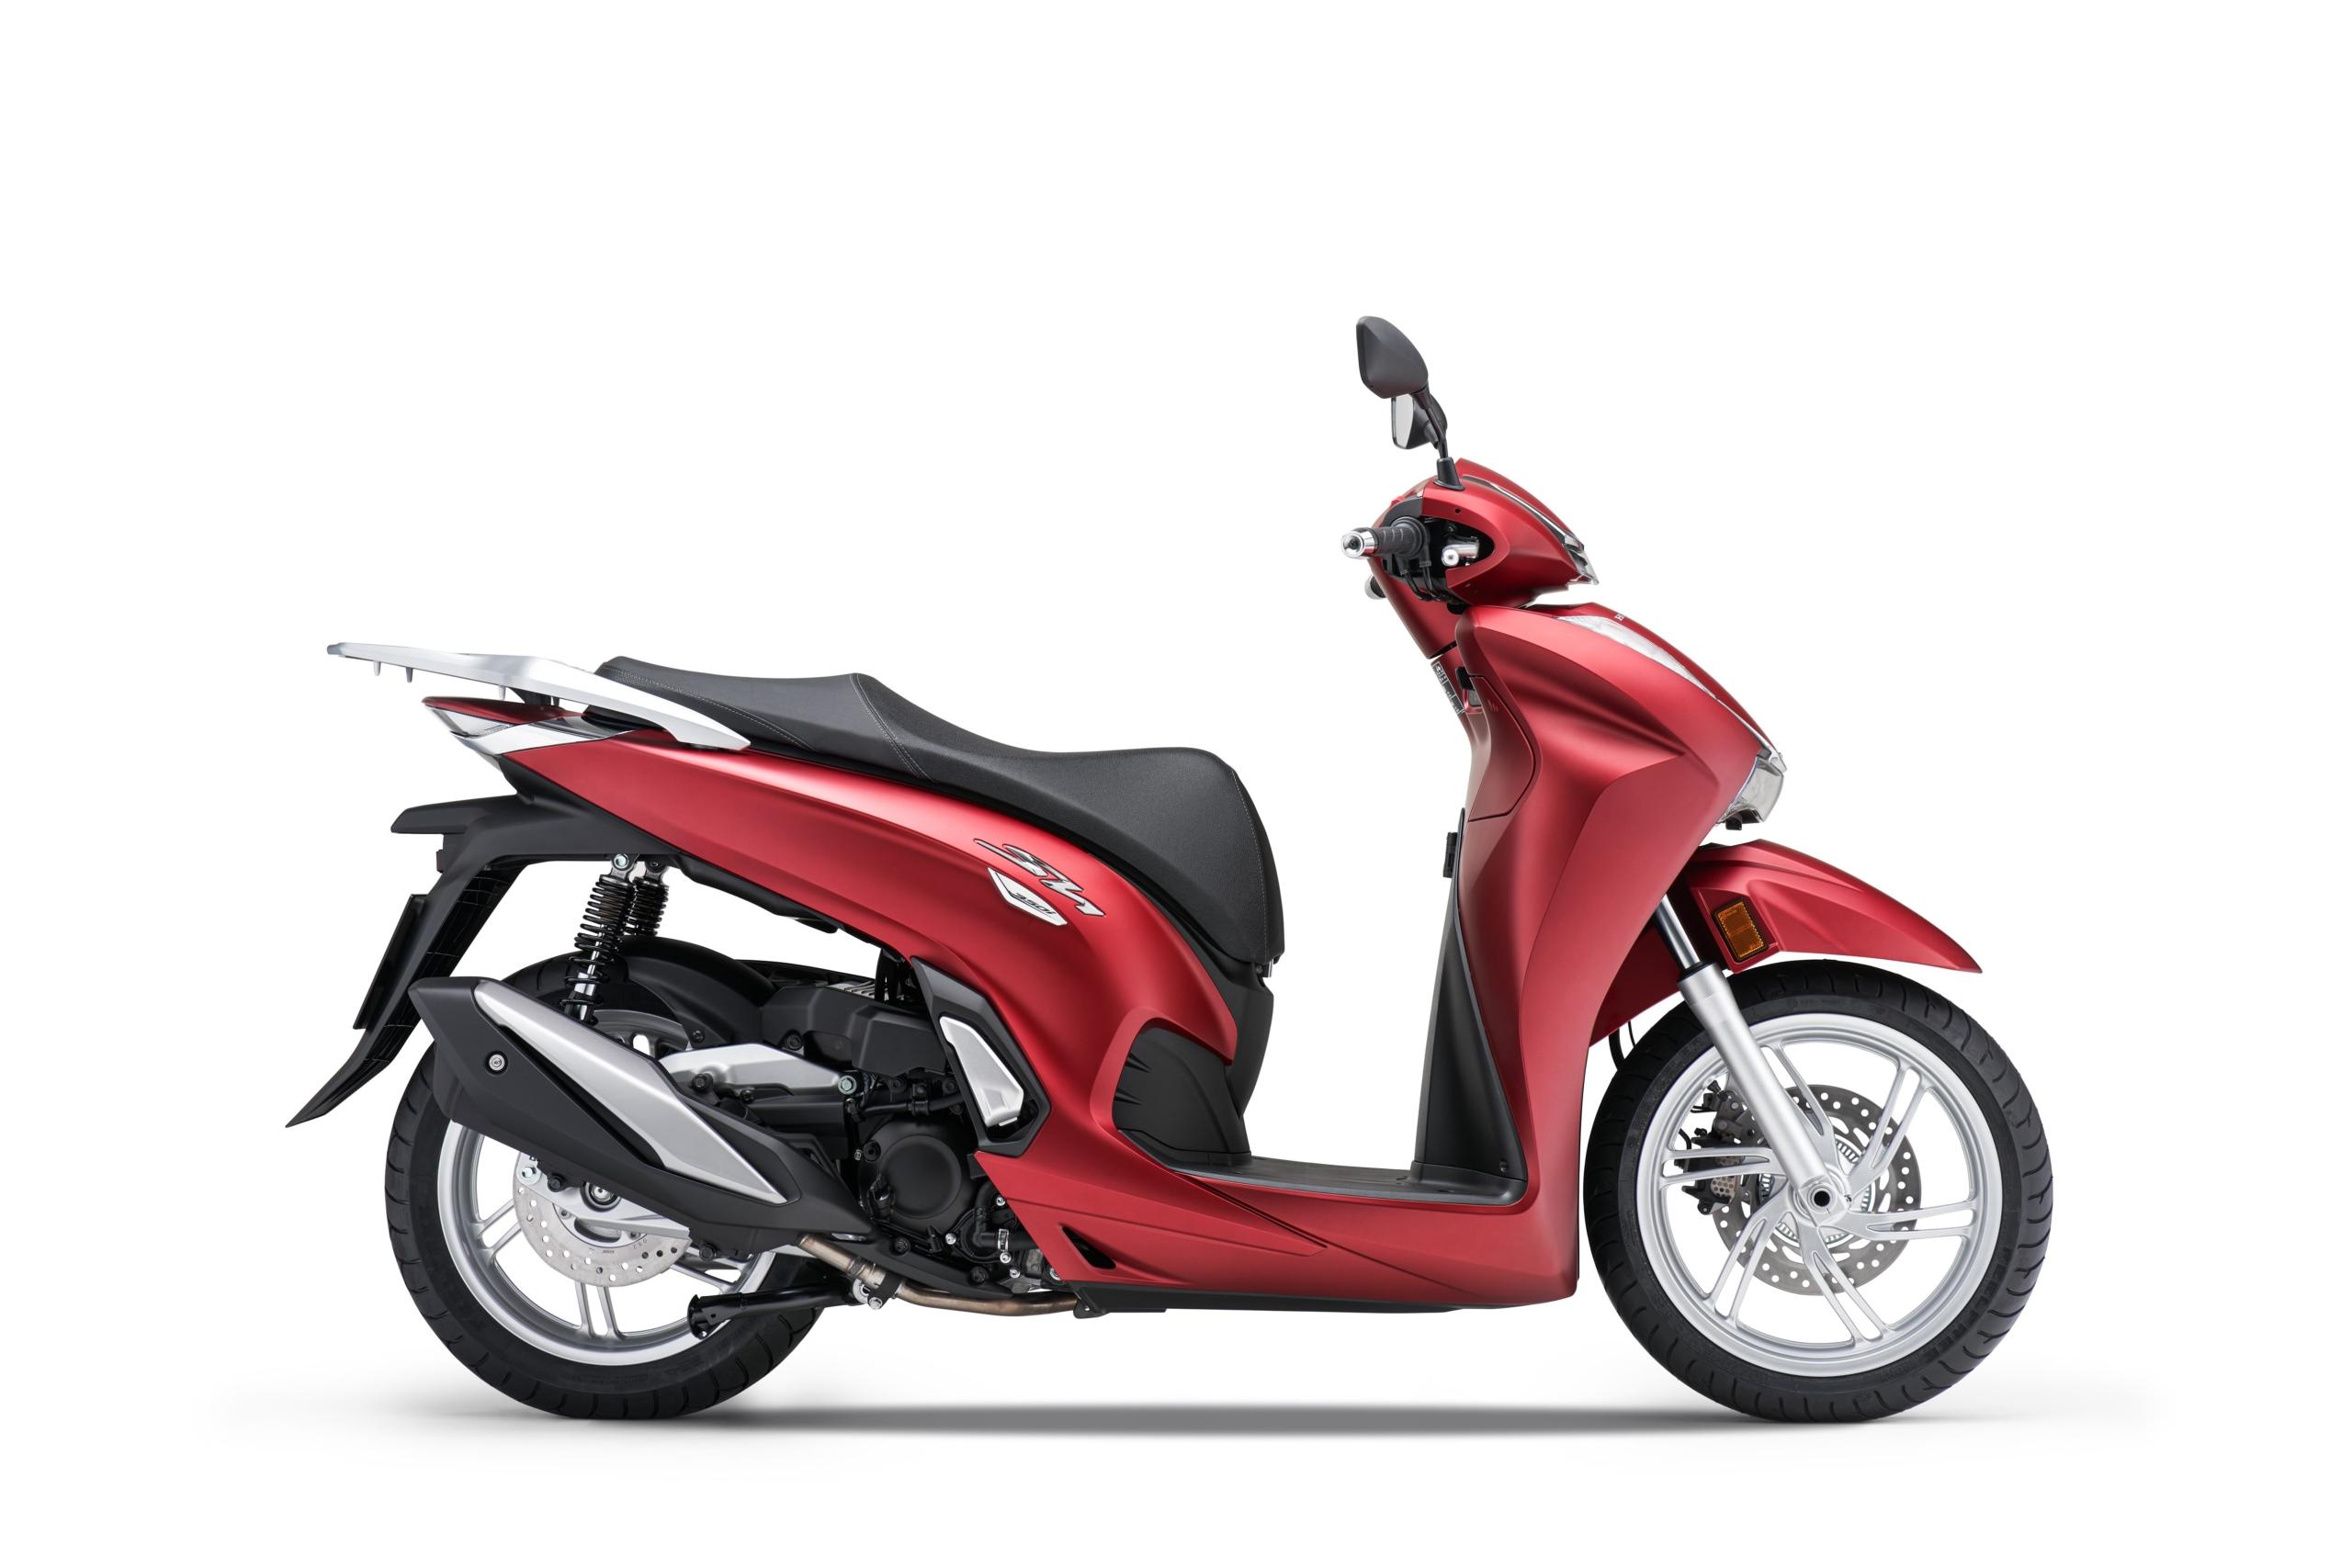 2021 CB1000R ja CB1000R Black Edition - Honda Keskus